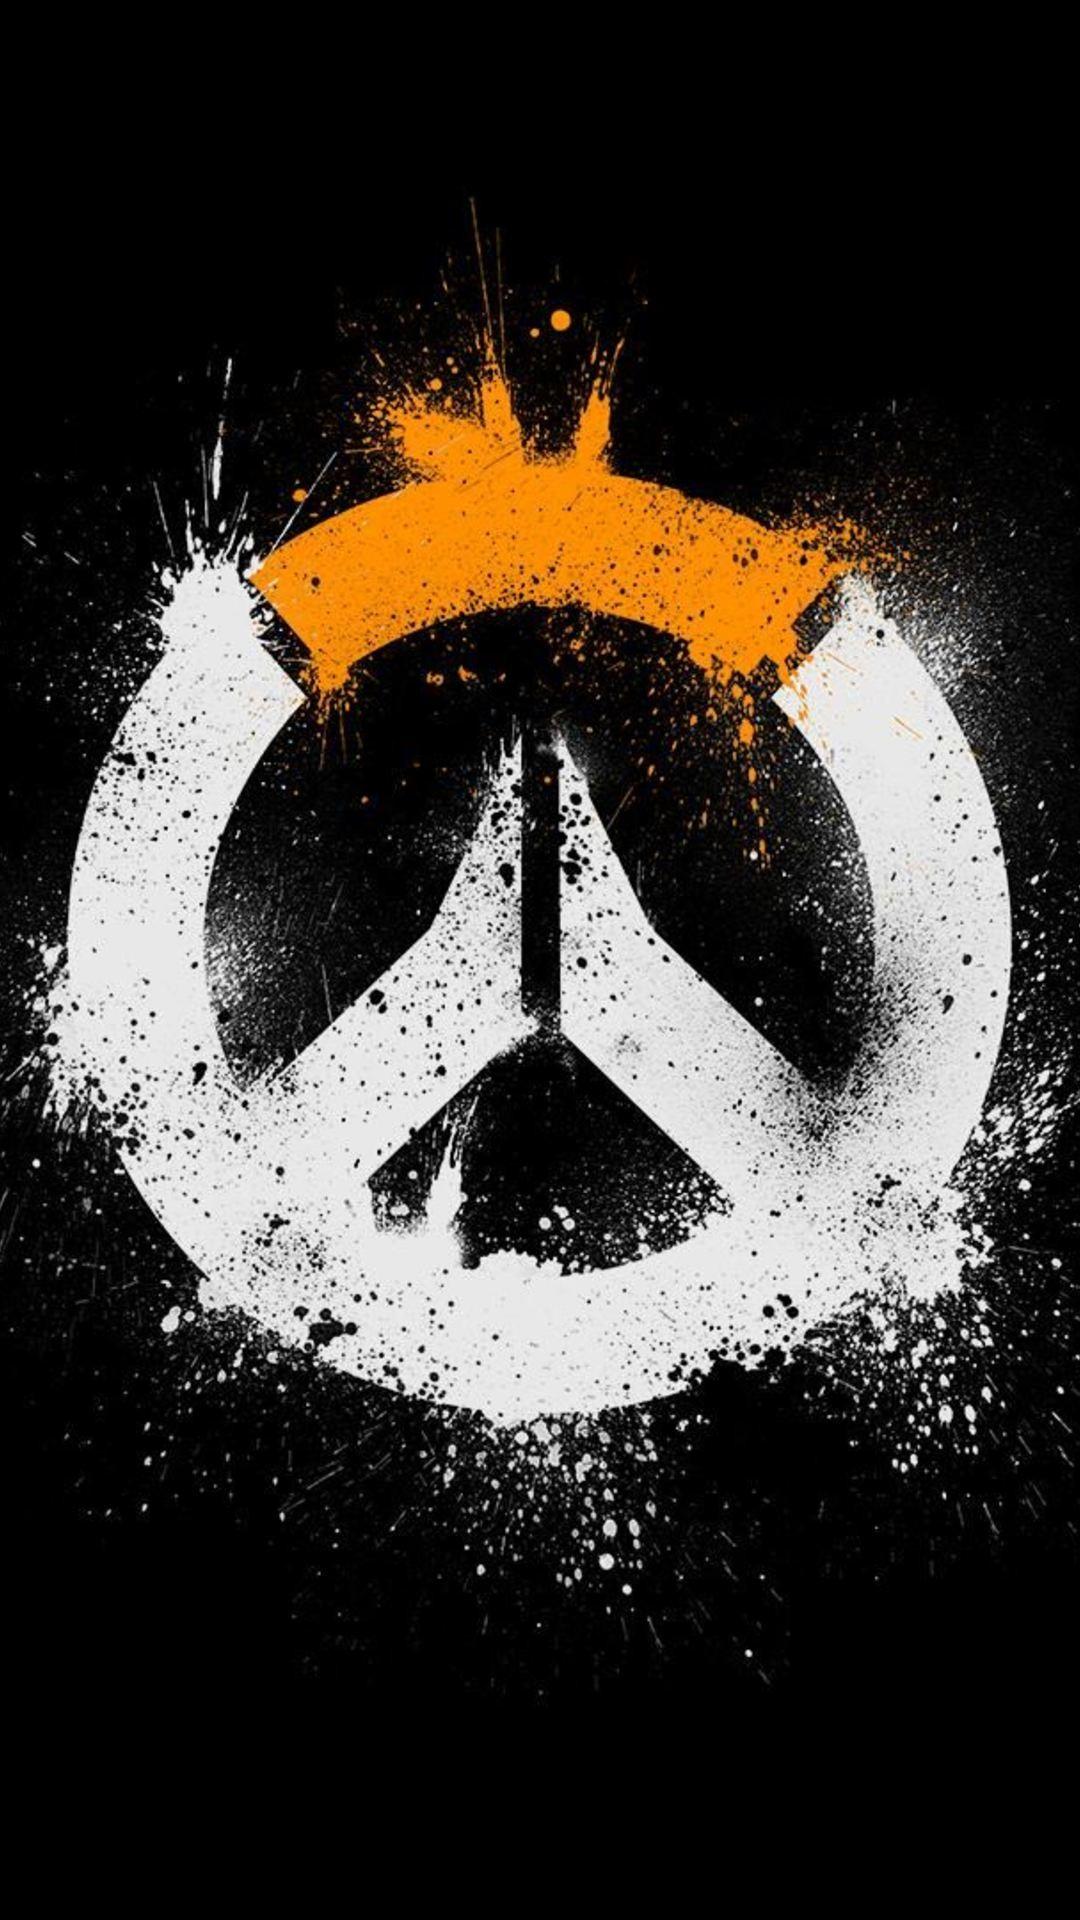 Overwatch Logo Hd Pic Wallpaper 1080x1920